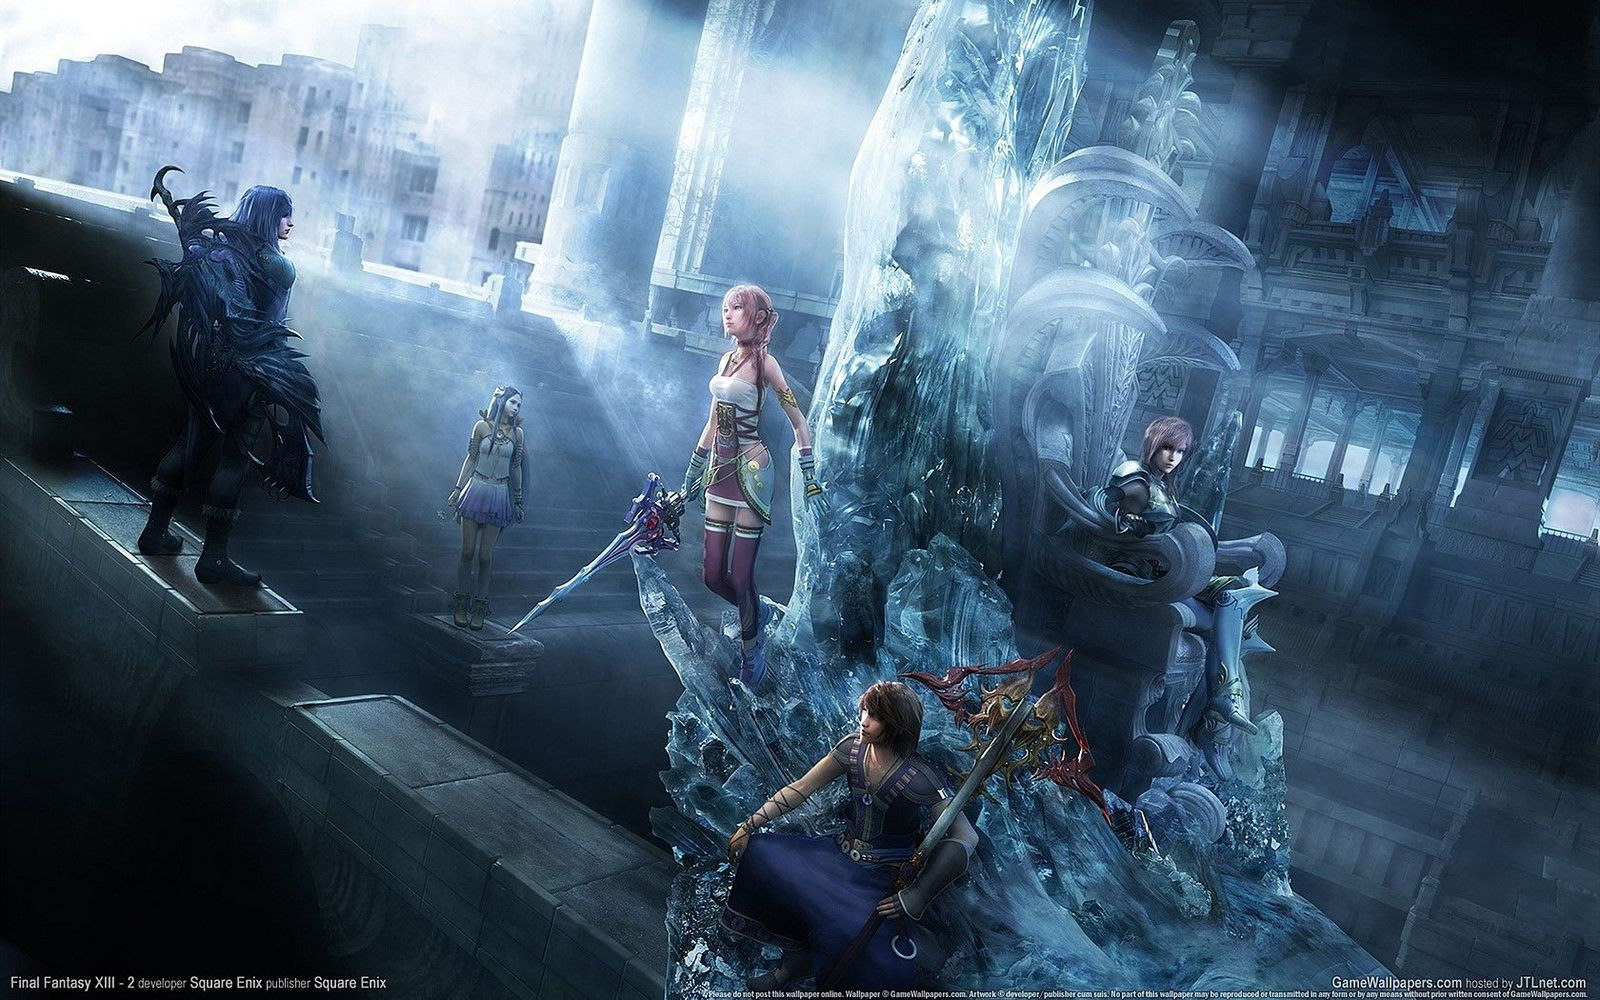 Final Fantasy Xiii 2 Hits Pc Next Month Final Fantasy Wallpaper